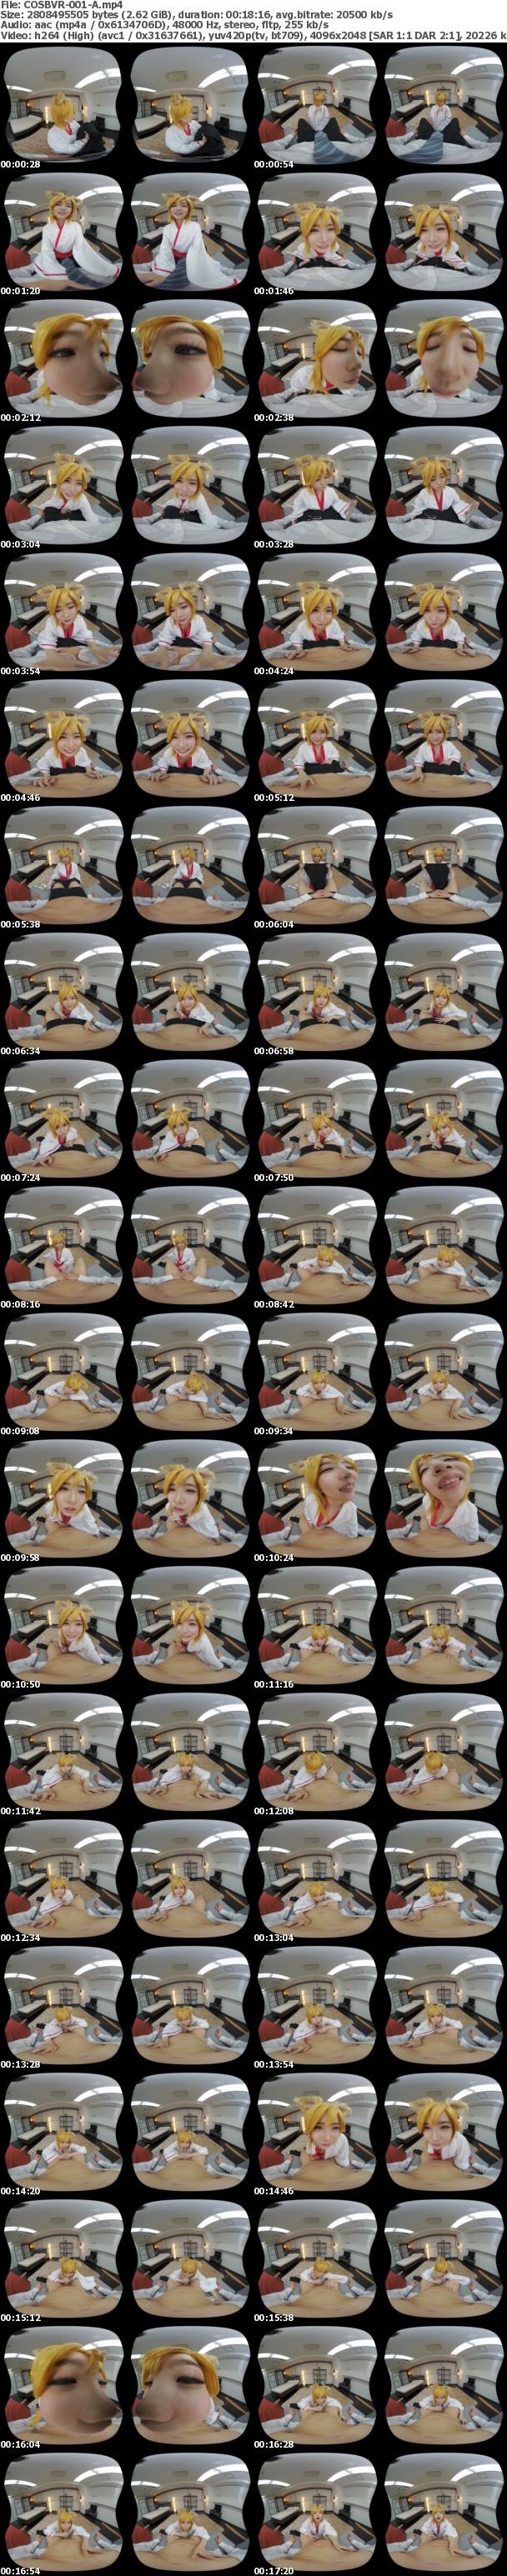 (VR) COSBVR-001 「わっちのナカにイッパイ中出してくりゃれ」枢木あおいちゃんが超絶可愛いのじゃロリ狐娘に大変身!世話焼き上手な萌え巫女狐娘